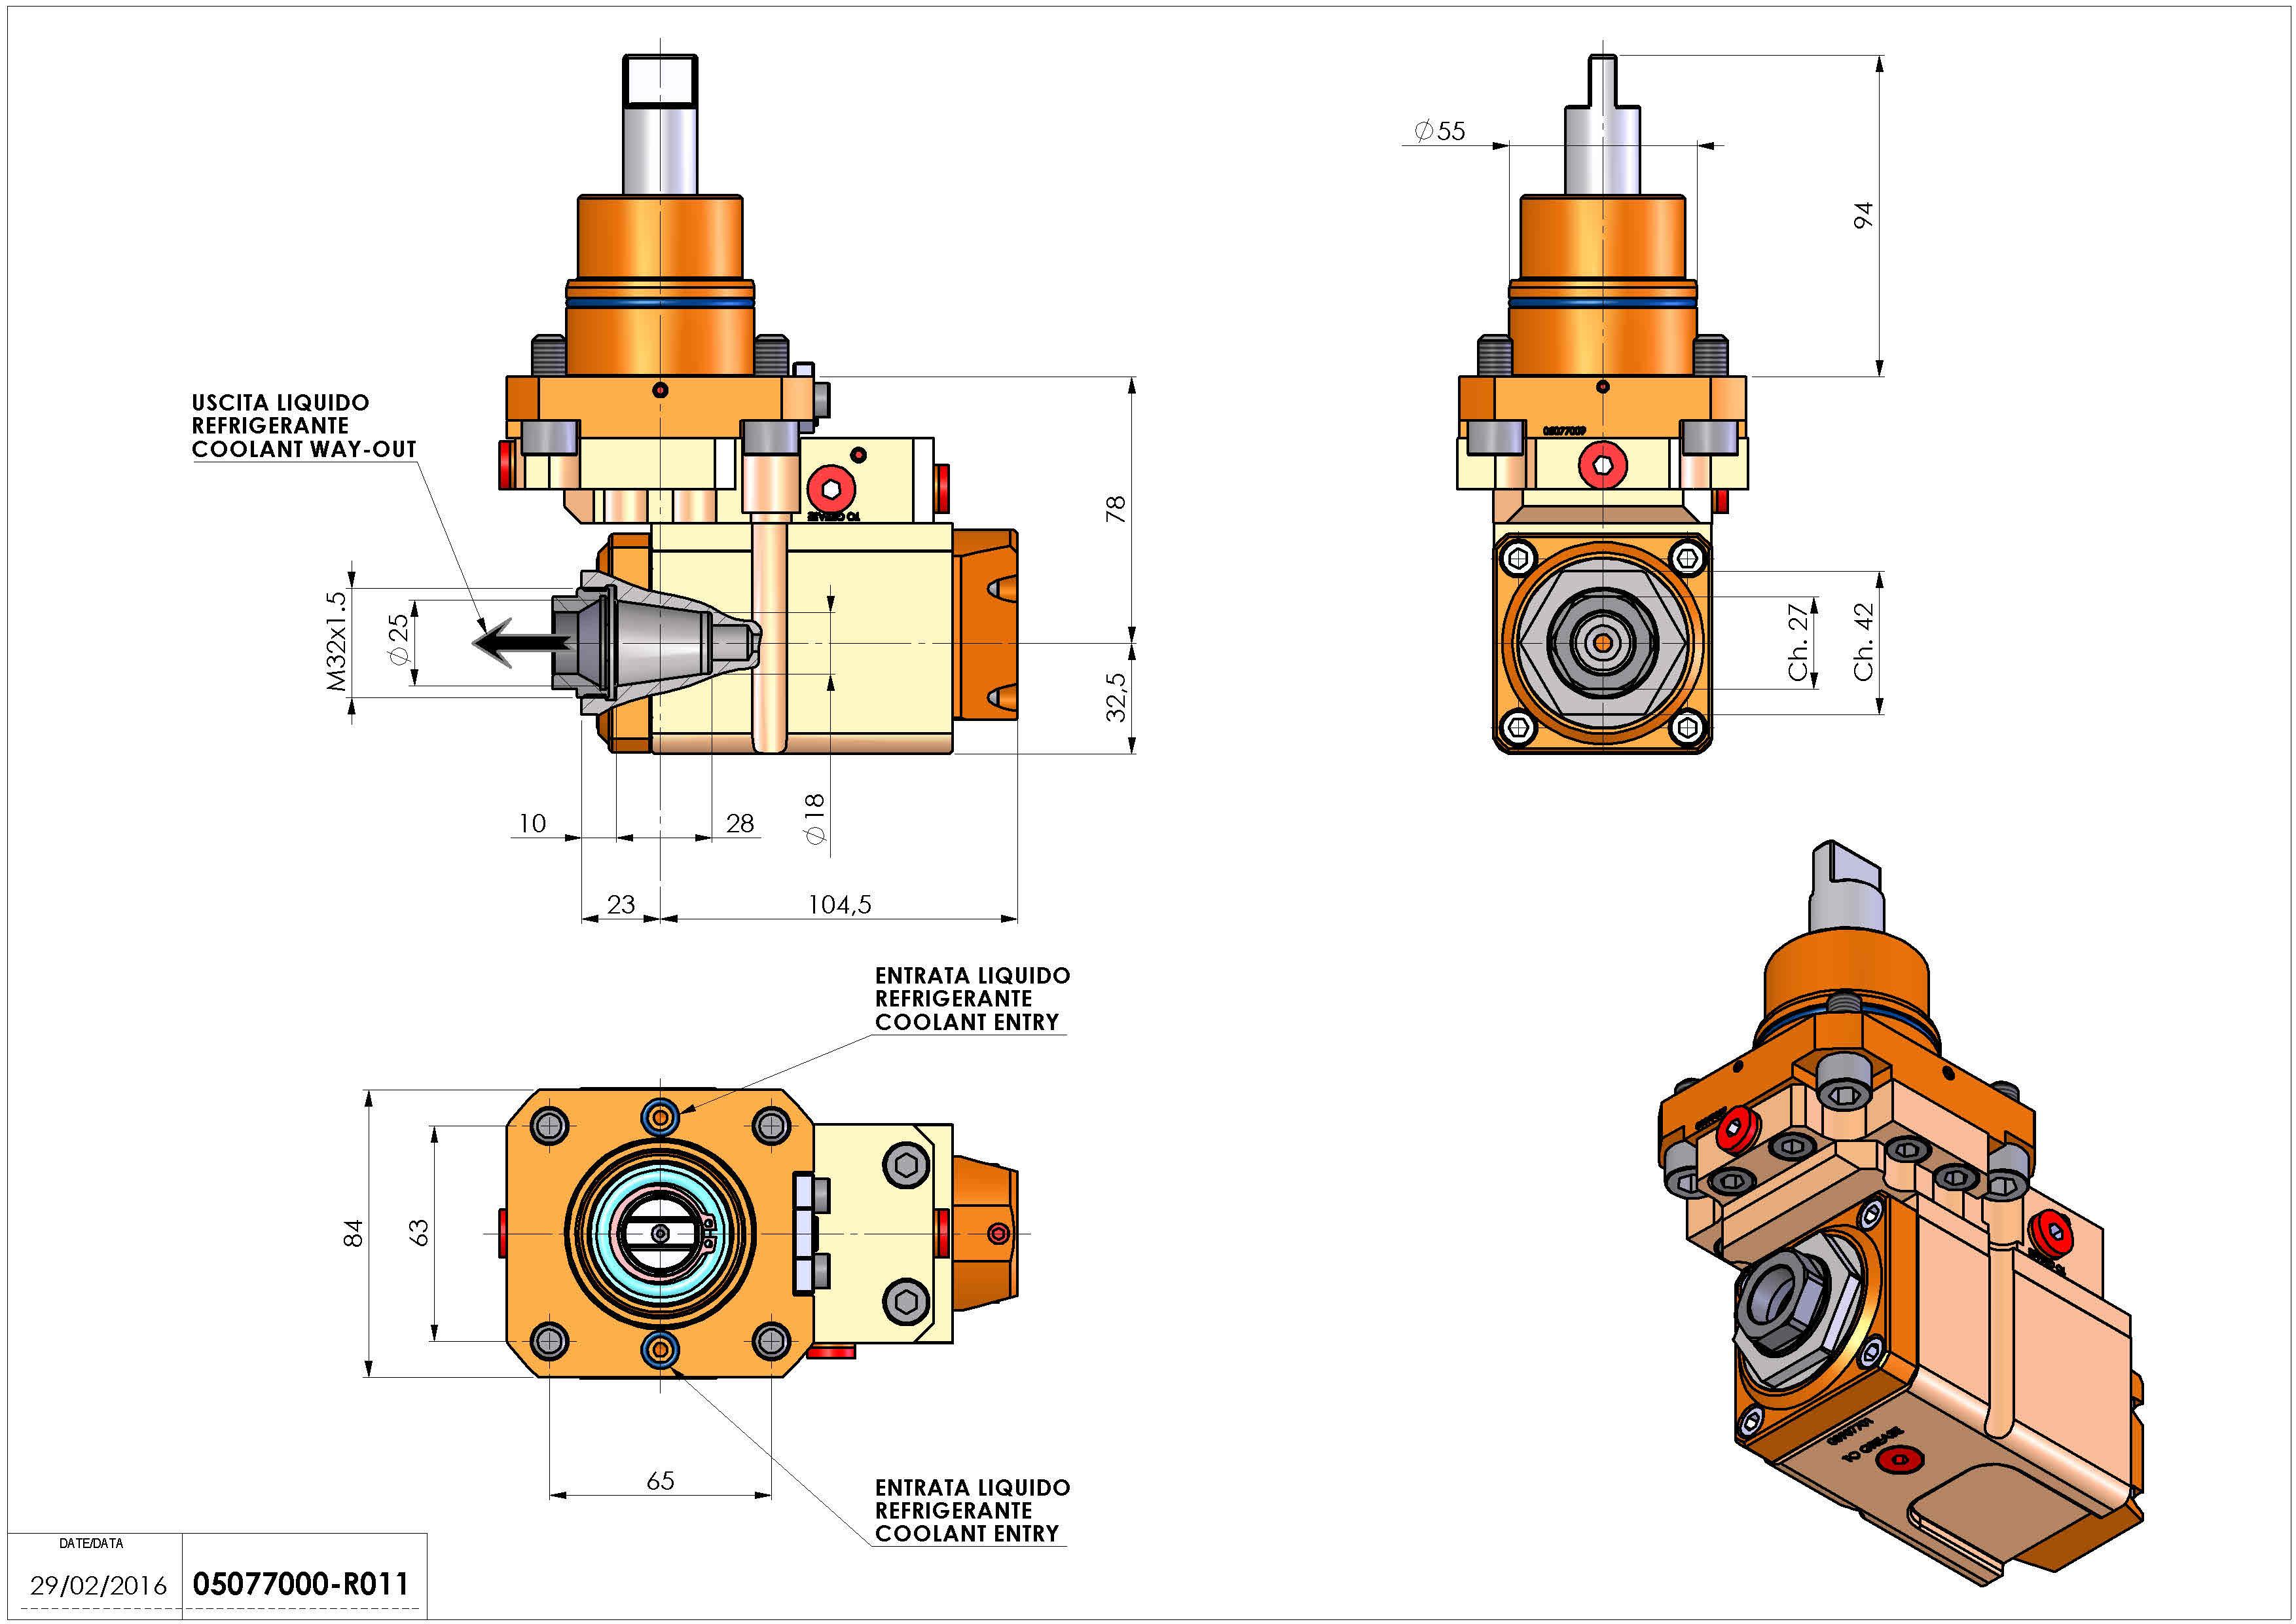 Technical image - LT-A D55 ER25F LR RF OFS H78BI.